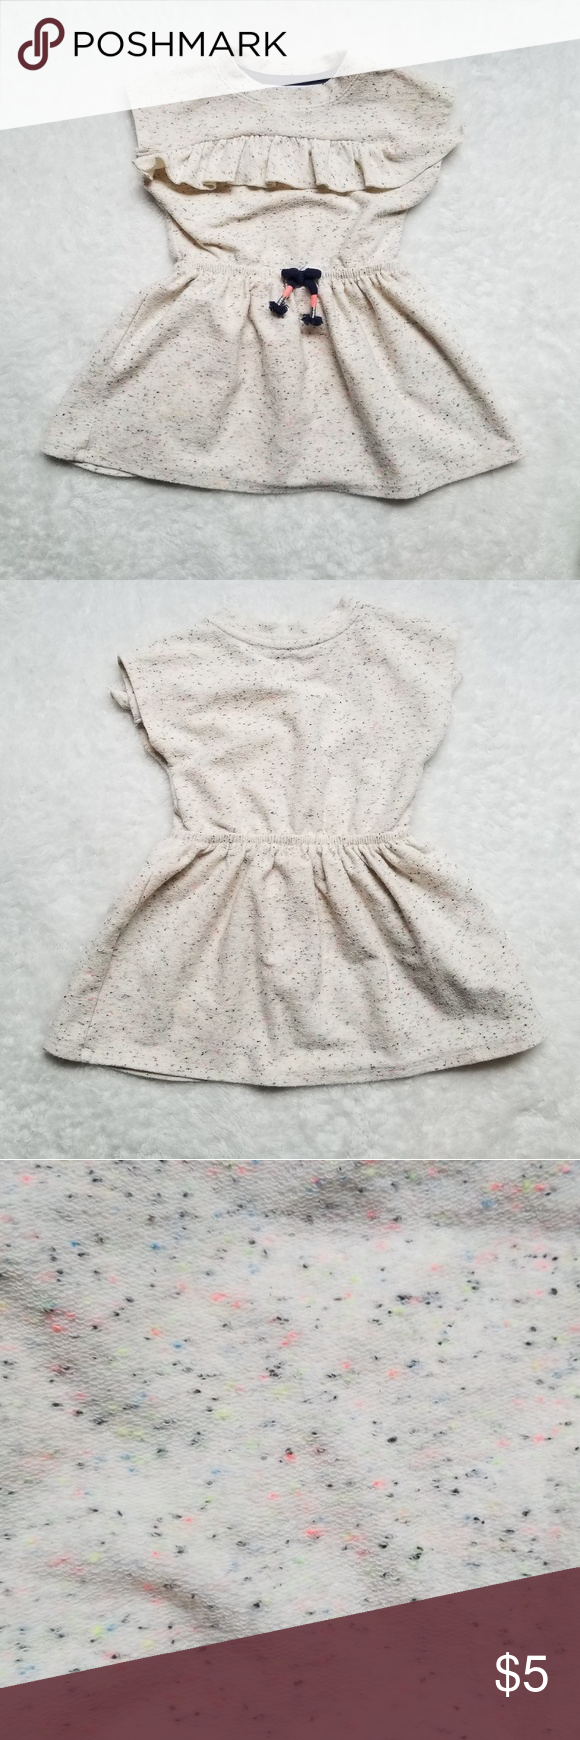 Summer Dress Summer Dresses Drawstring Dresses Size 18 Dress [ 1740 x 580 Pixel ]